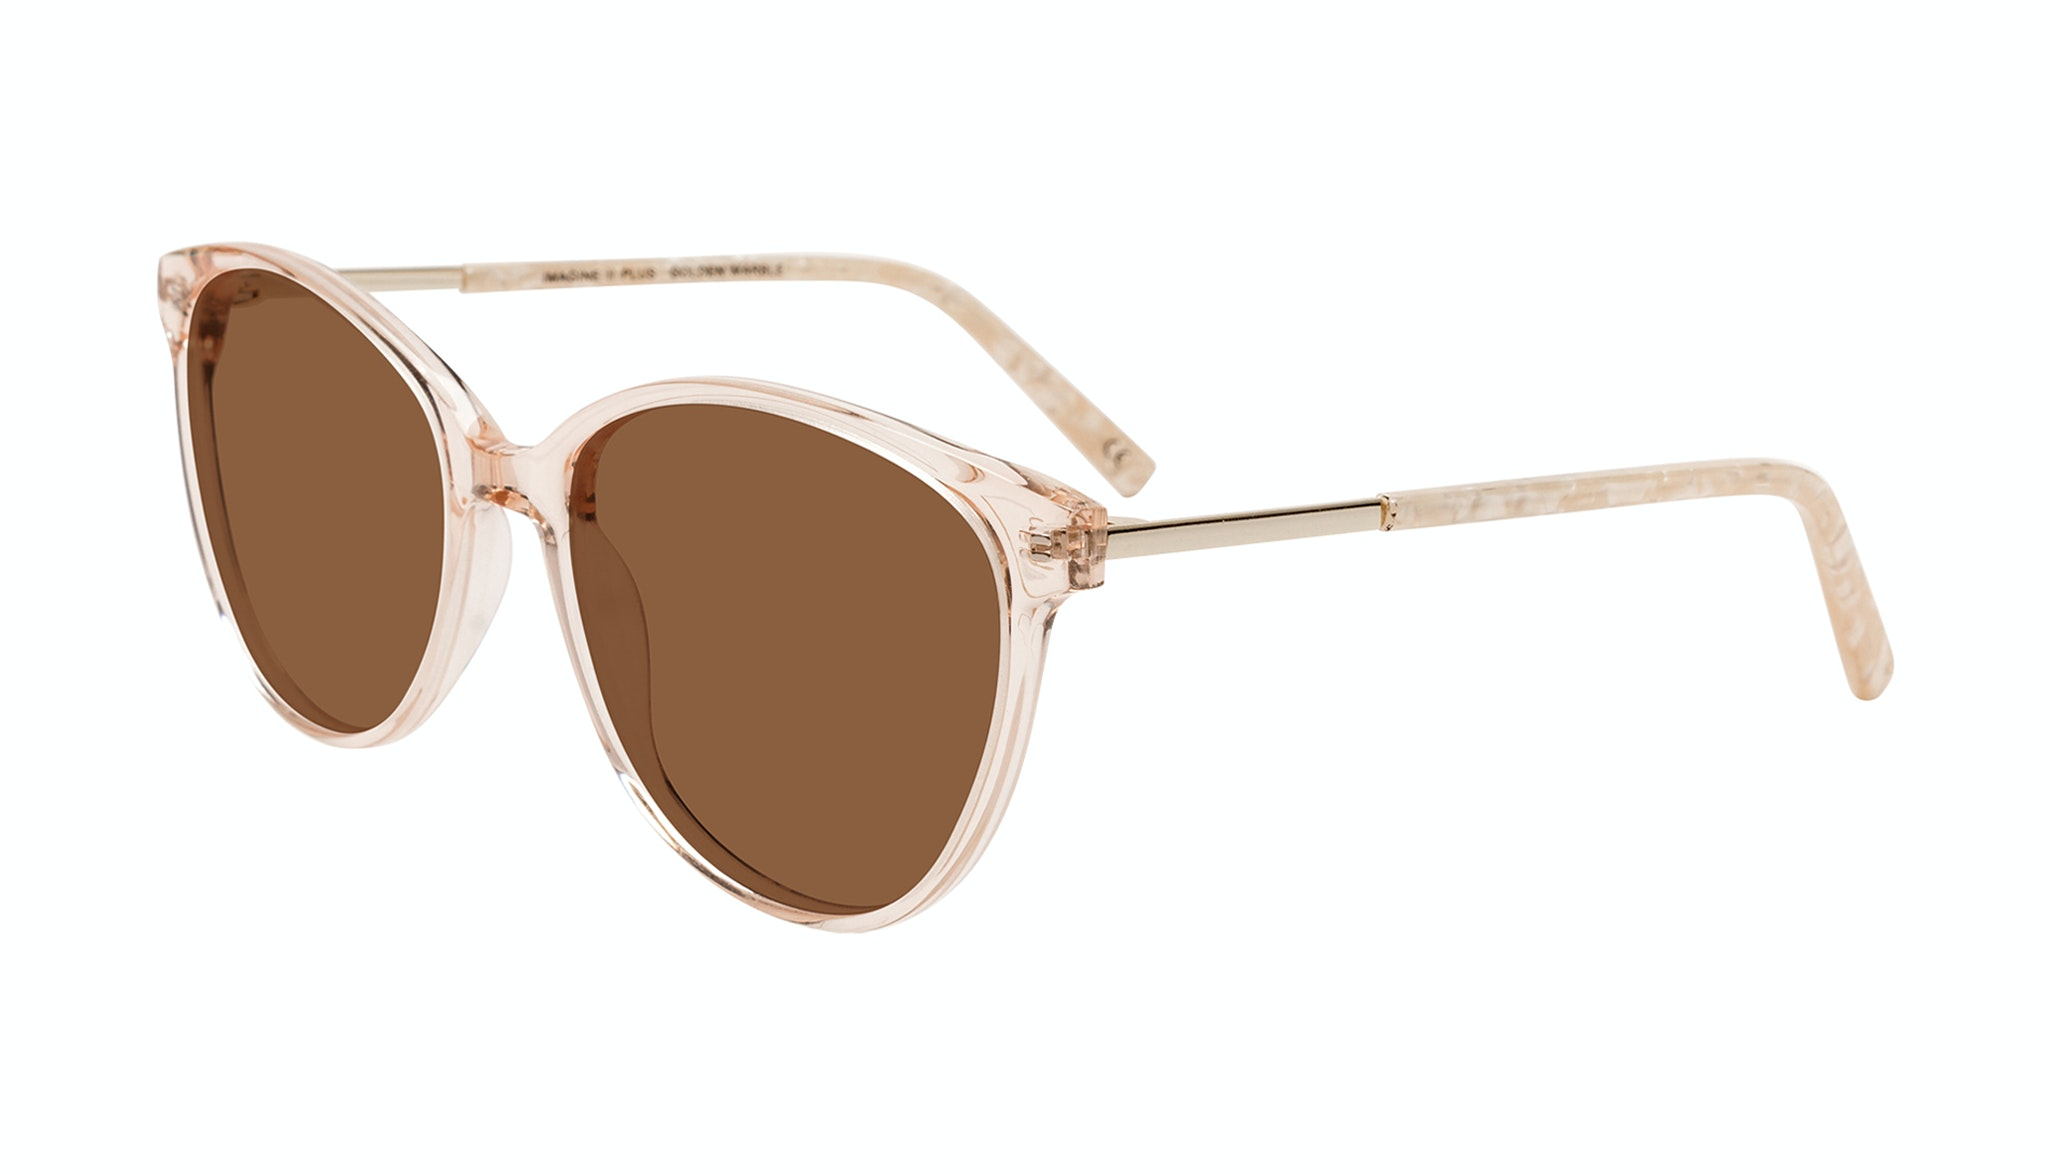 Affordable Fashion Glasses Round Sunglasses Women Imagine II Plus Golden Marble Tilt